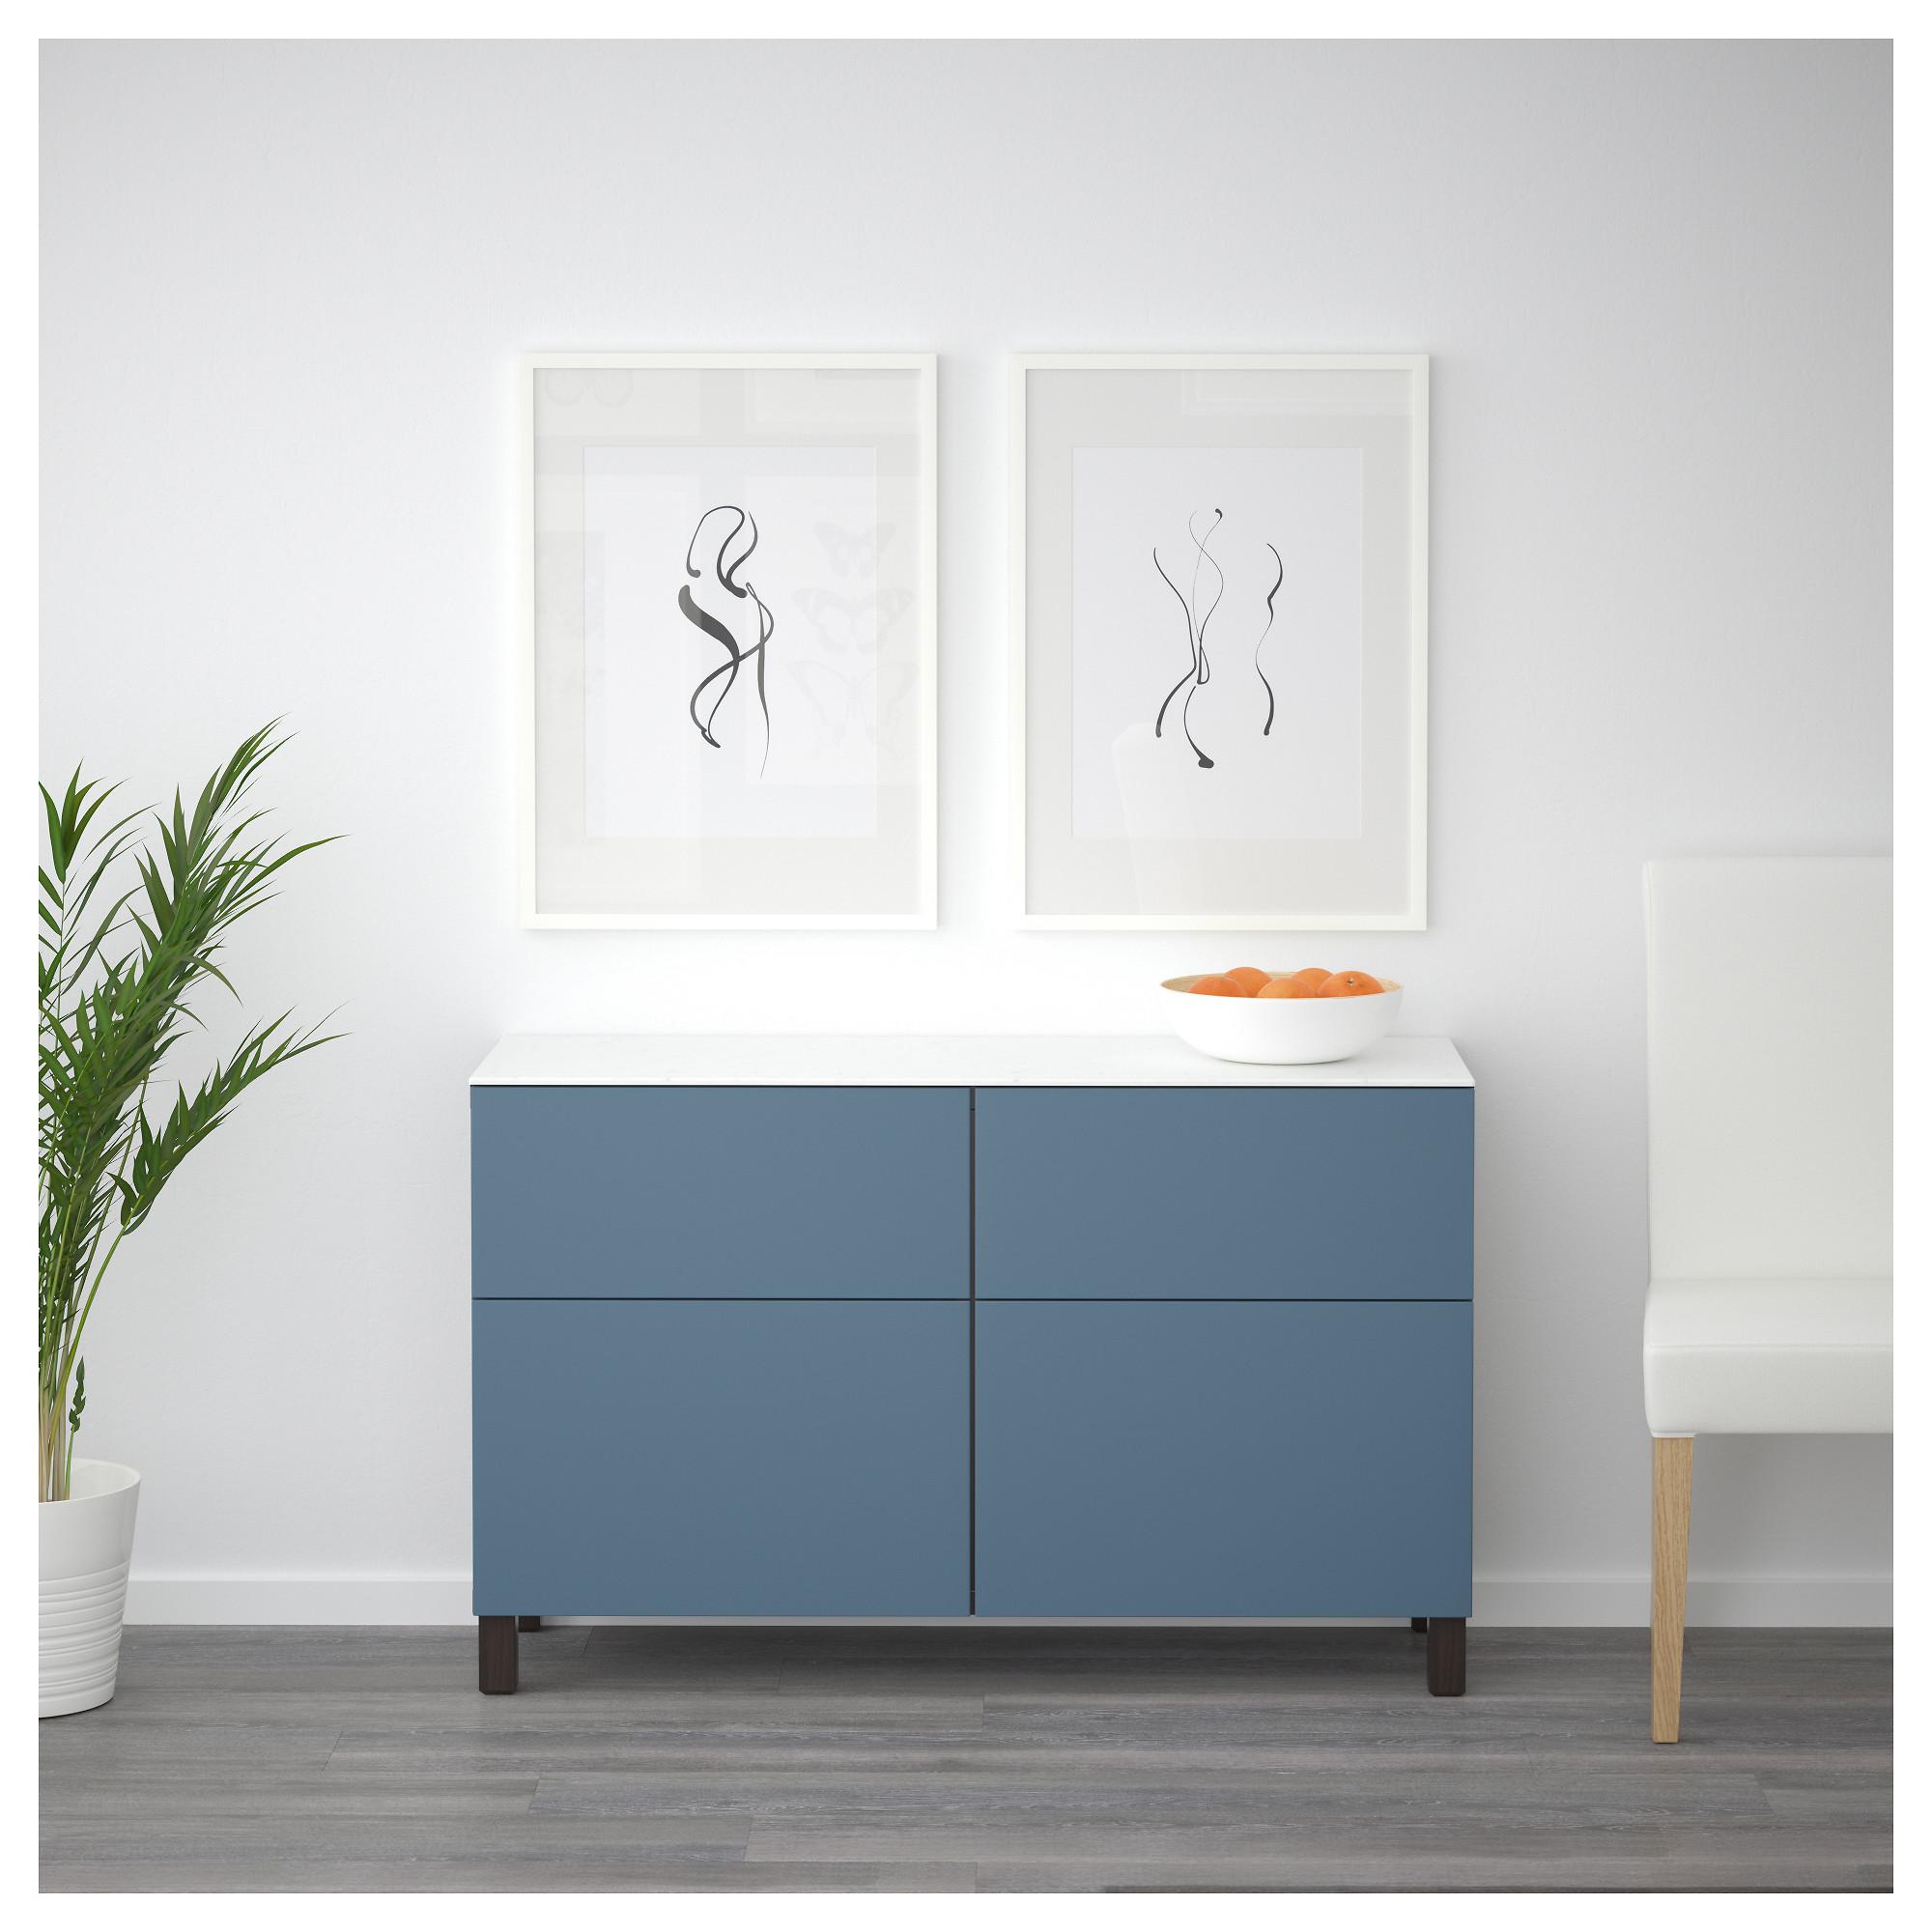 Комбинация для хранения с дверцами, ящиками БЕСТО темно-синий артикуль № 092.447.15 в наличии. Интернет магазин IKEA Беларусь. Недорогая доставка и установка.